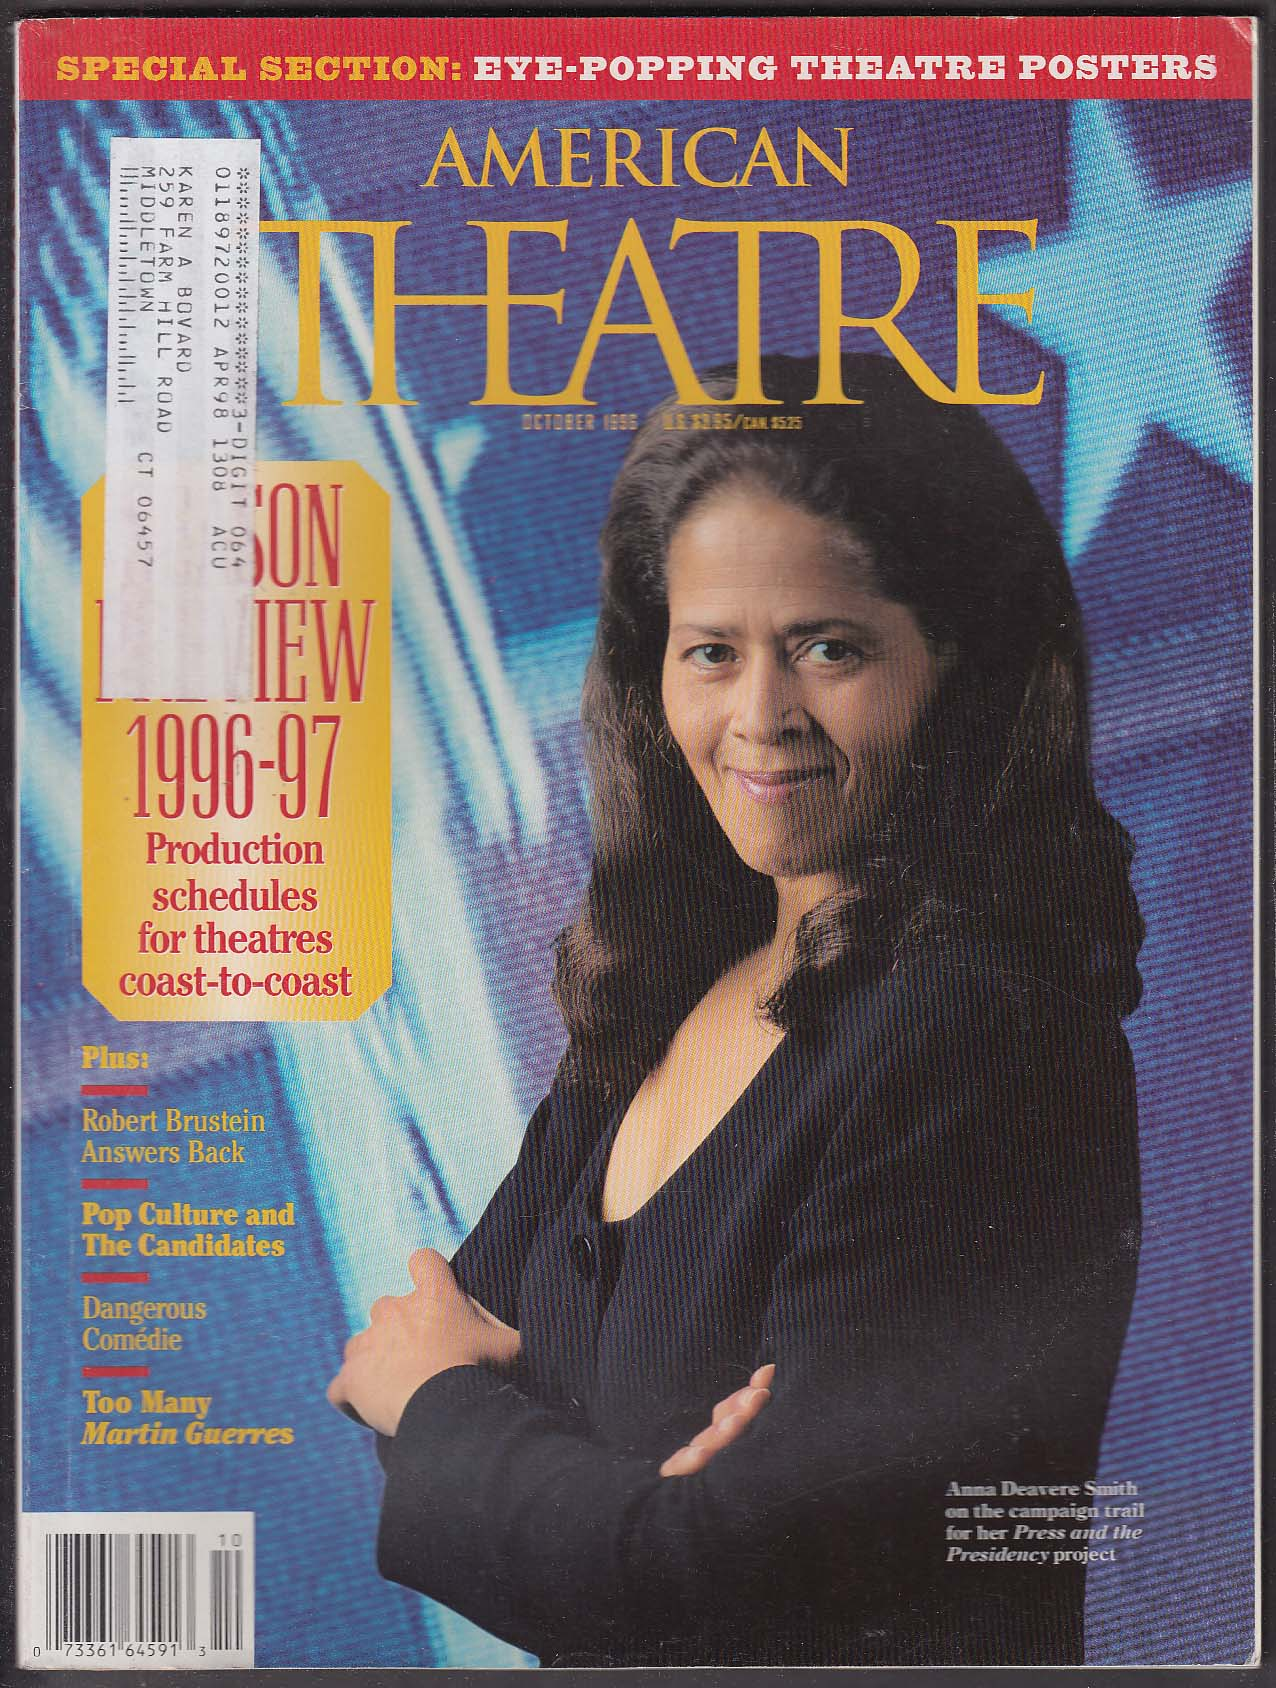 AMERICAN THEATRE Anna Deavere Smith Robert Brustein Martin Guerres ++ 10 1996